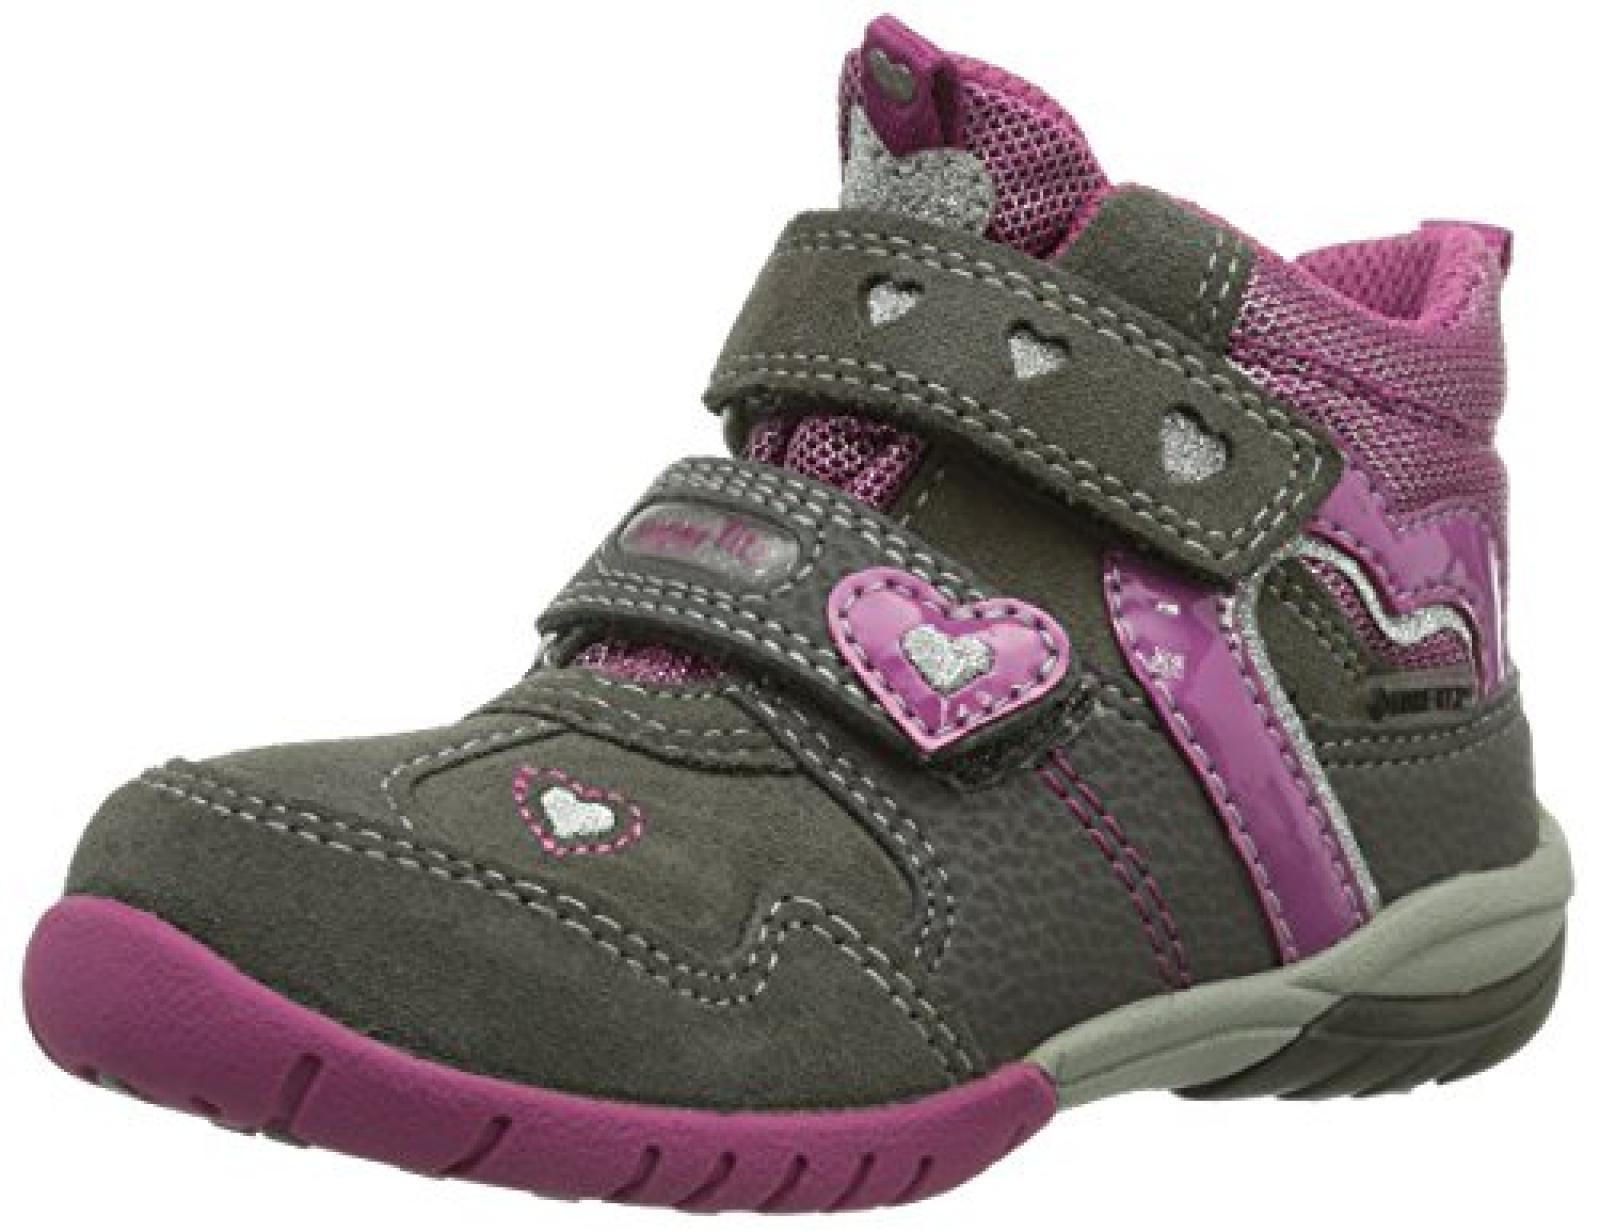 Superfit 30013607  SPORT3, Mädchen Hohe Sneakers